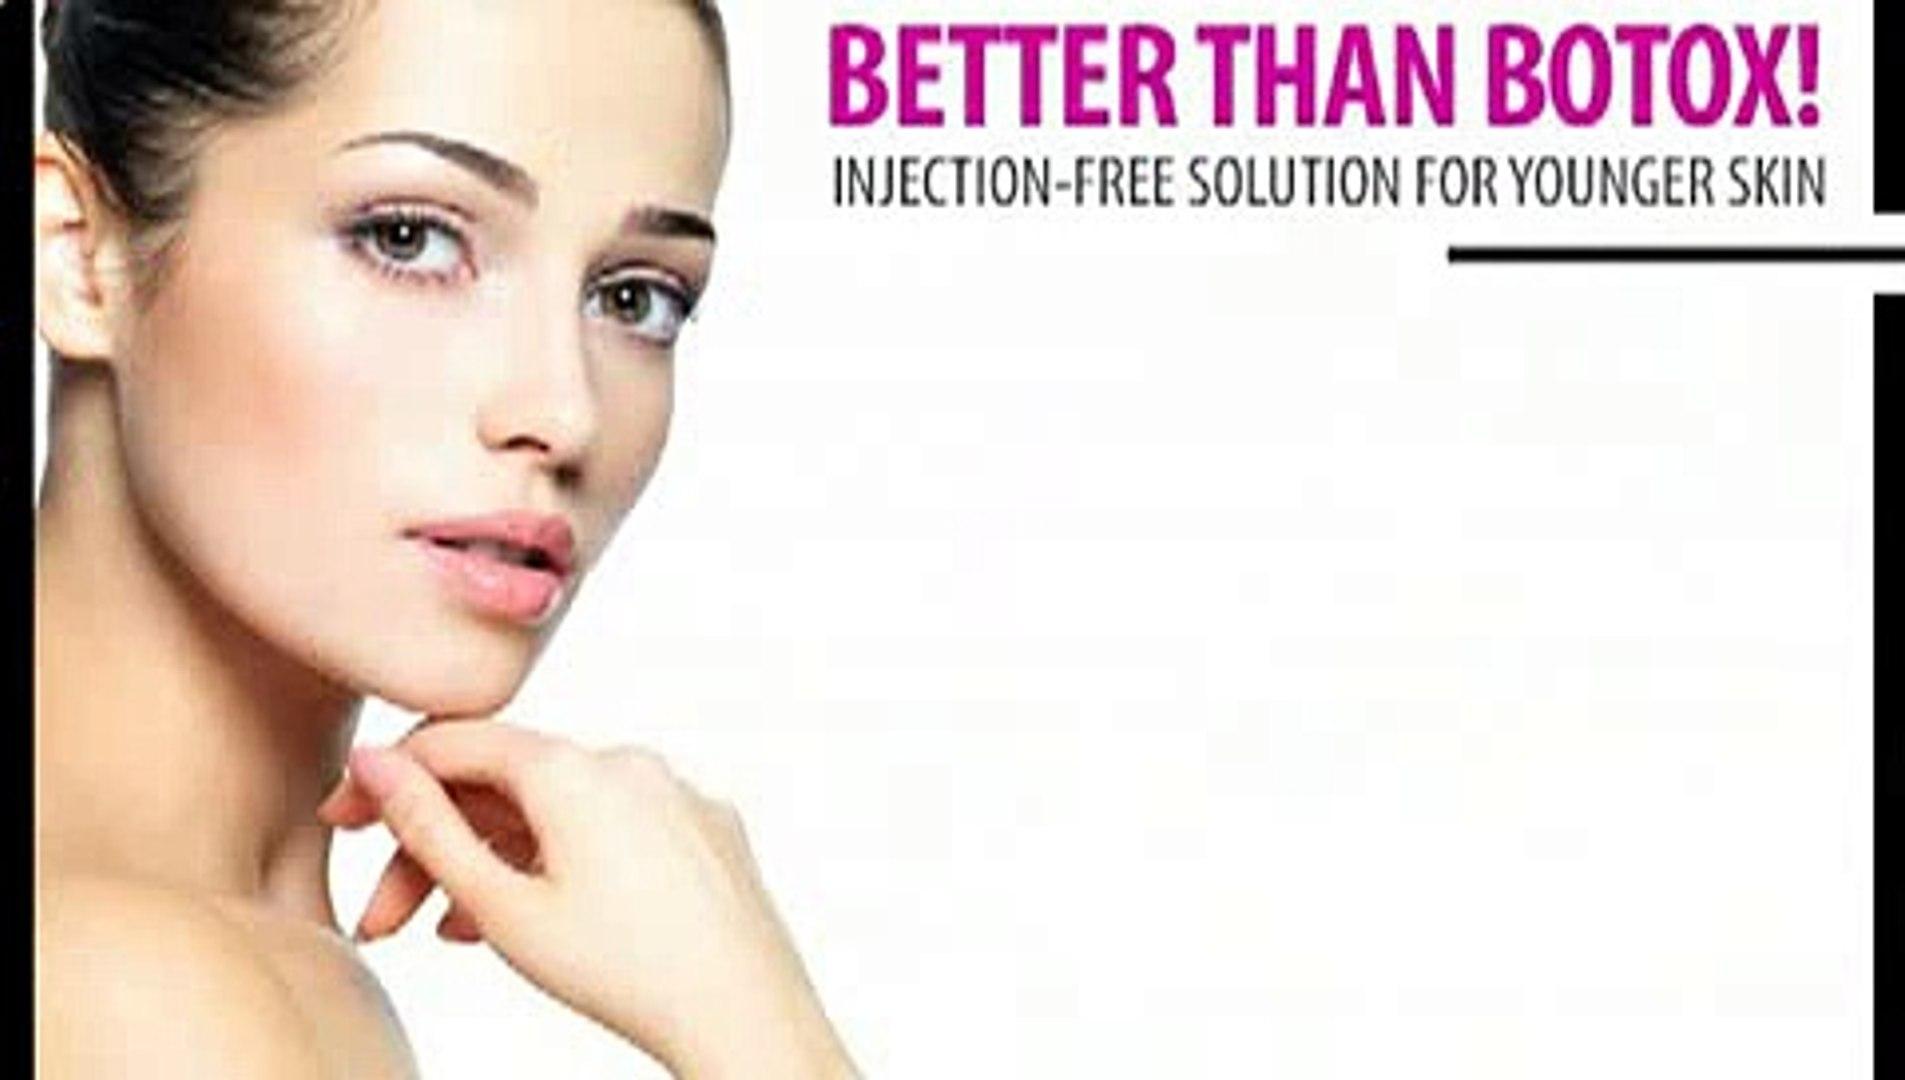 Ageless Body System | Organic Body  | My Acne  | Anti Wrinkle Cream  | Anti Aging Cream  | Best Wrin